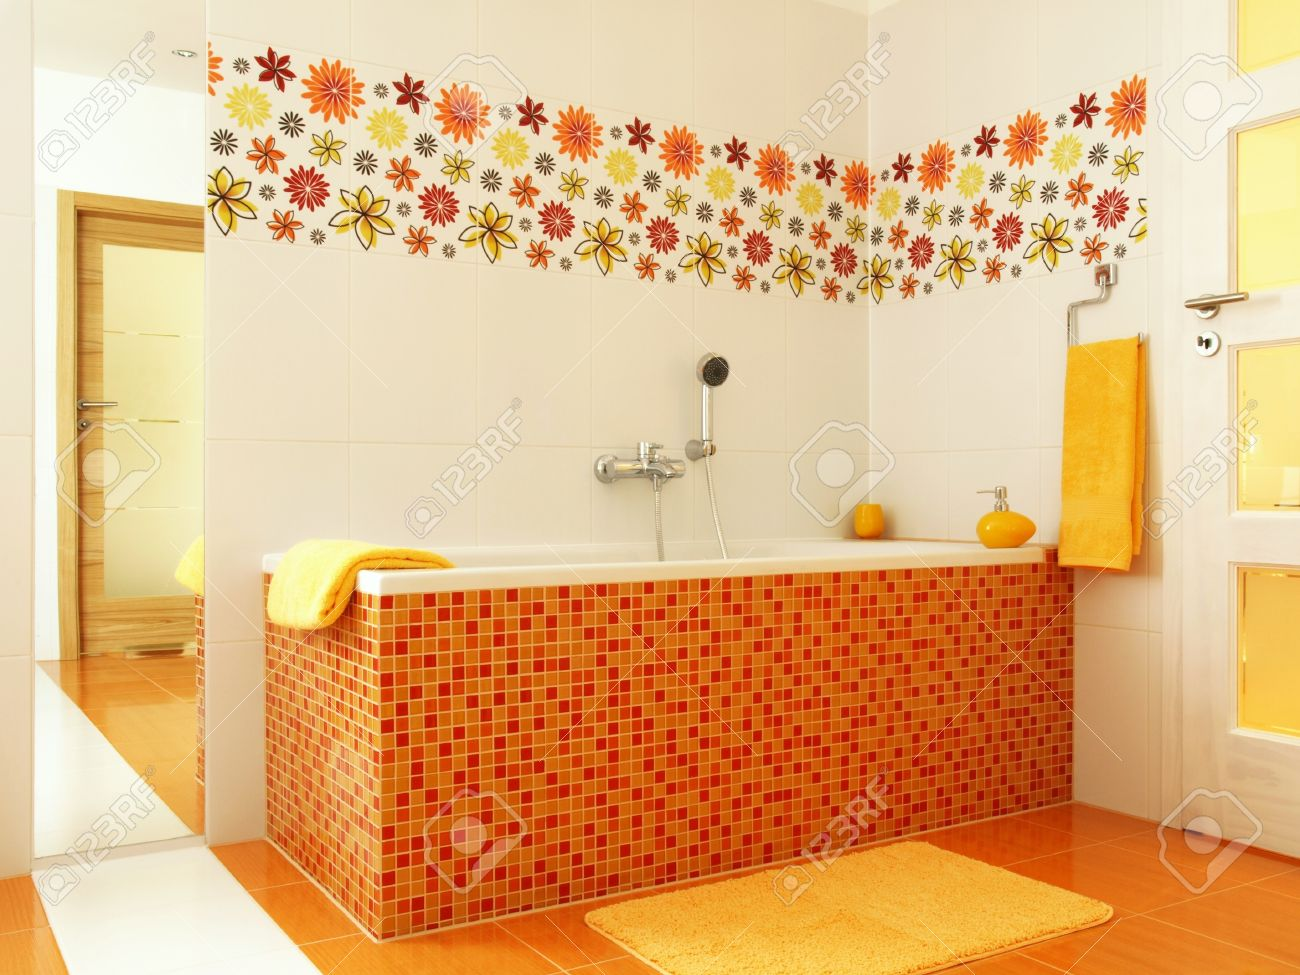 bagni moderni mosaico. bagno moderno moderno mosaico idee ... - Bagni Con Mosaico Moderni